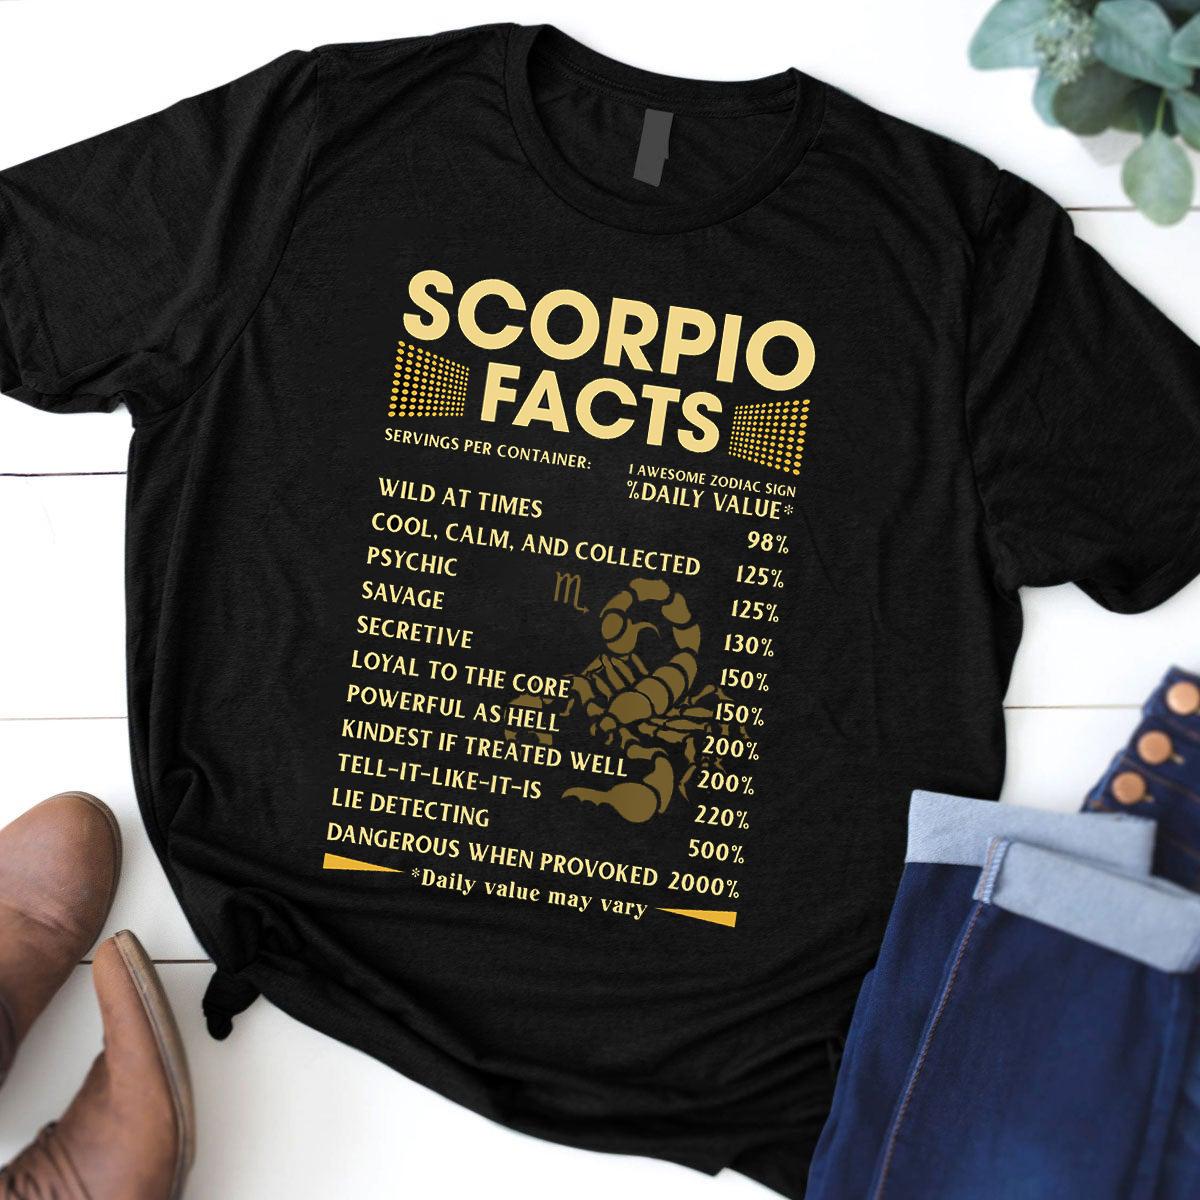 Scorpio Facts Shirt 1 Awesome Zodiac Sign